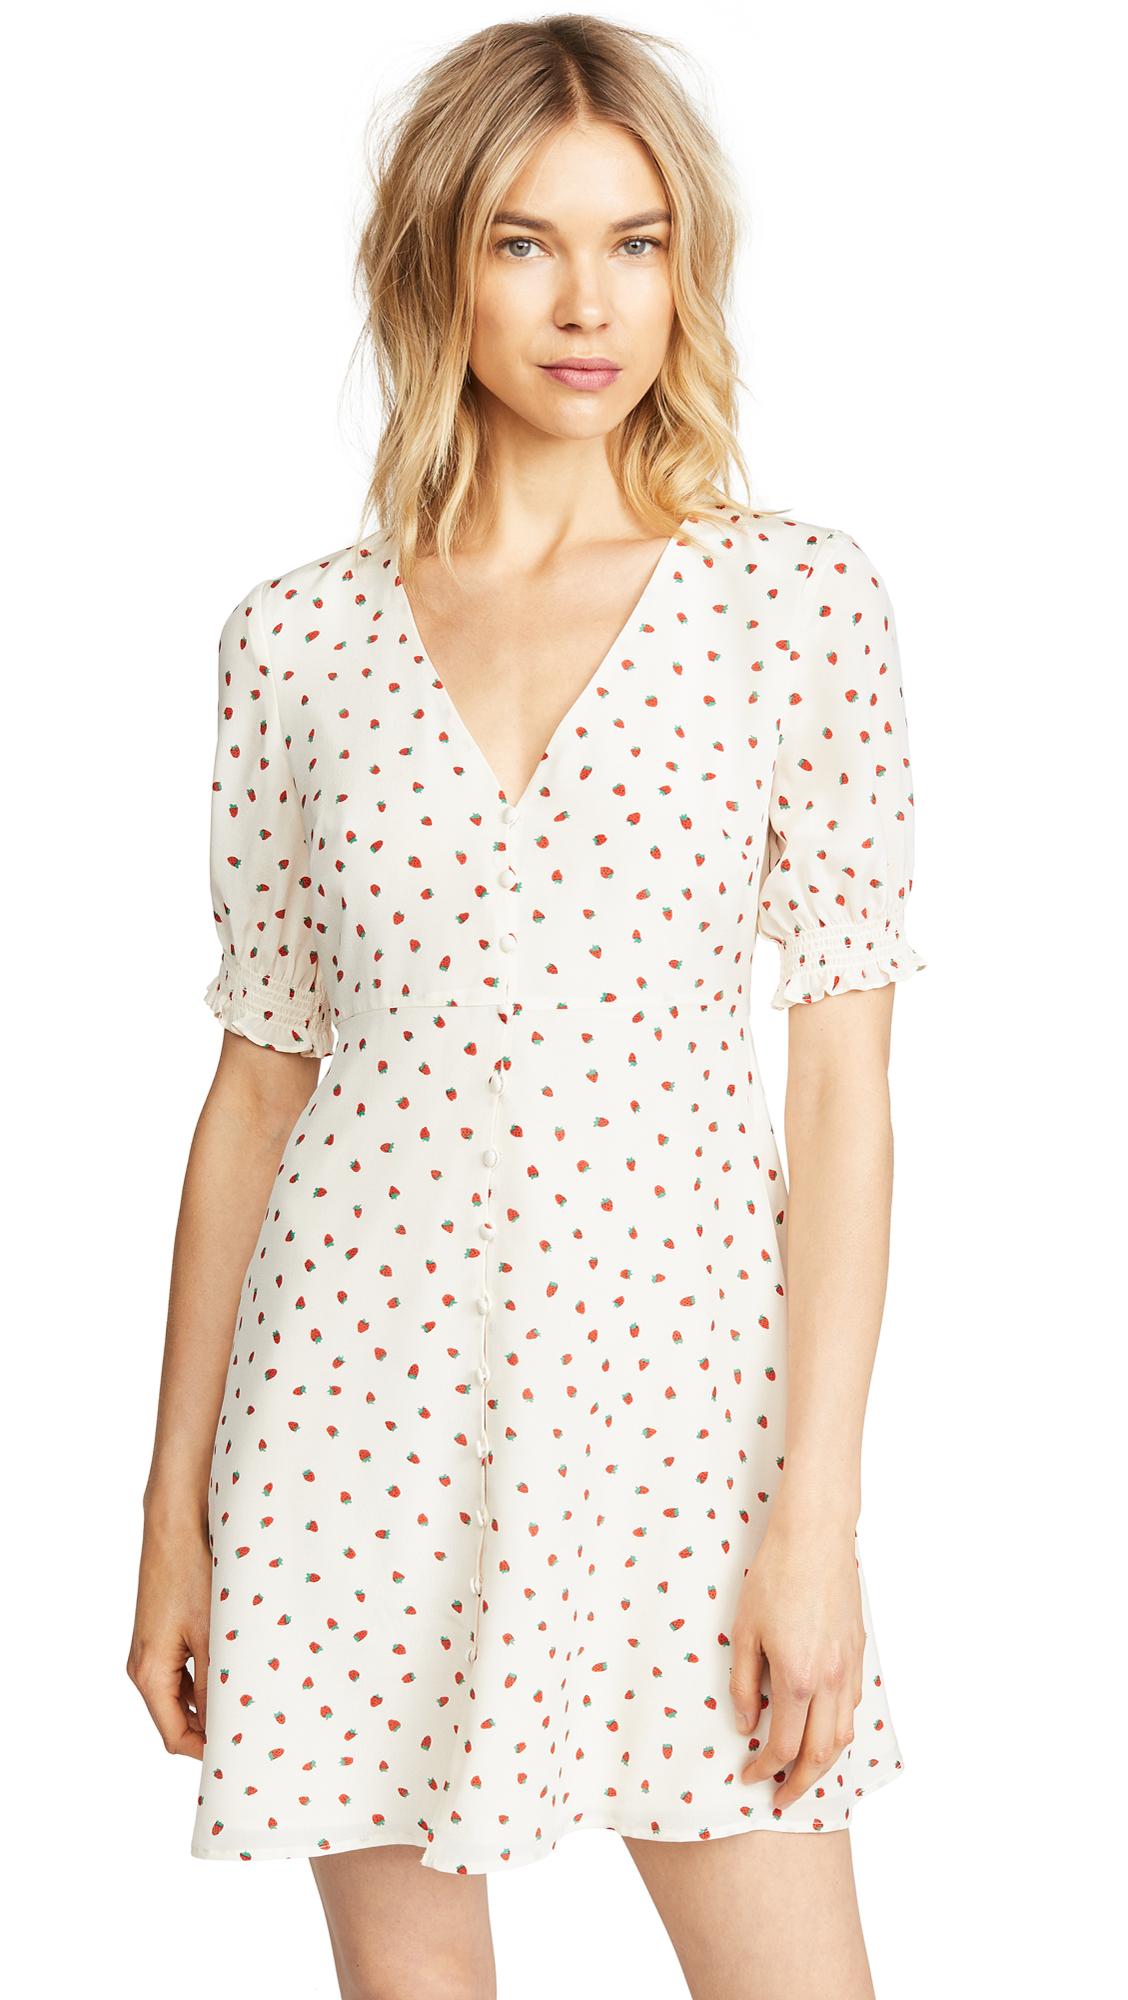 Madewell Stawberries Retro Dress Shopbop D Island Casual Wrinkle Vintage